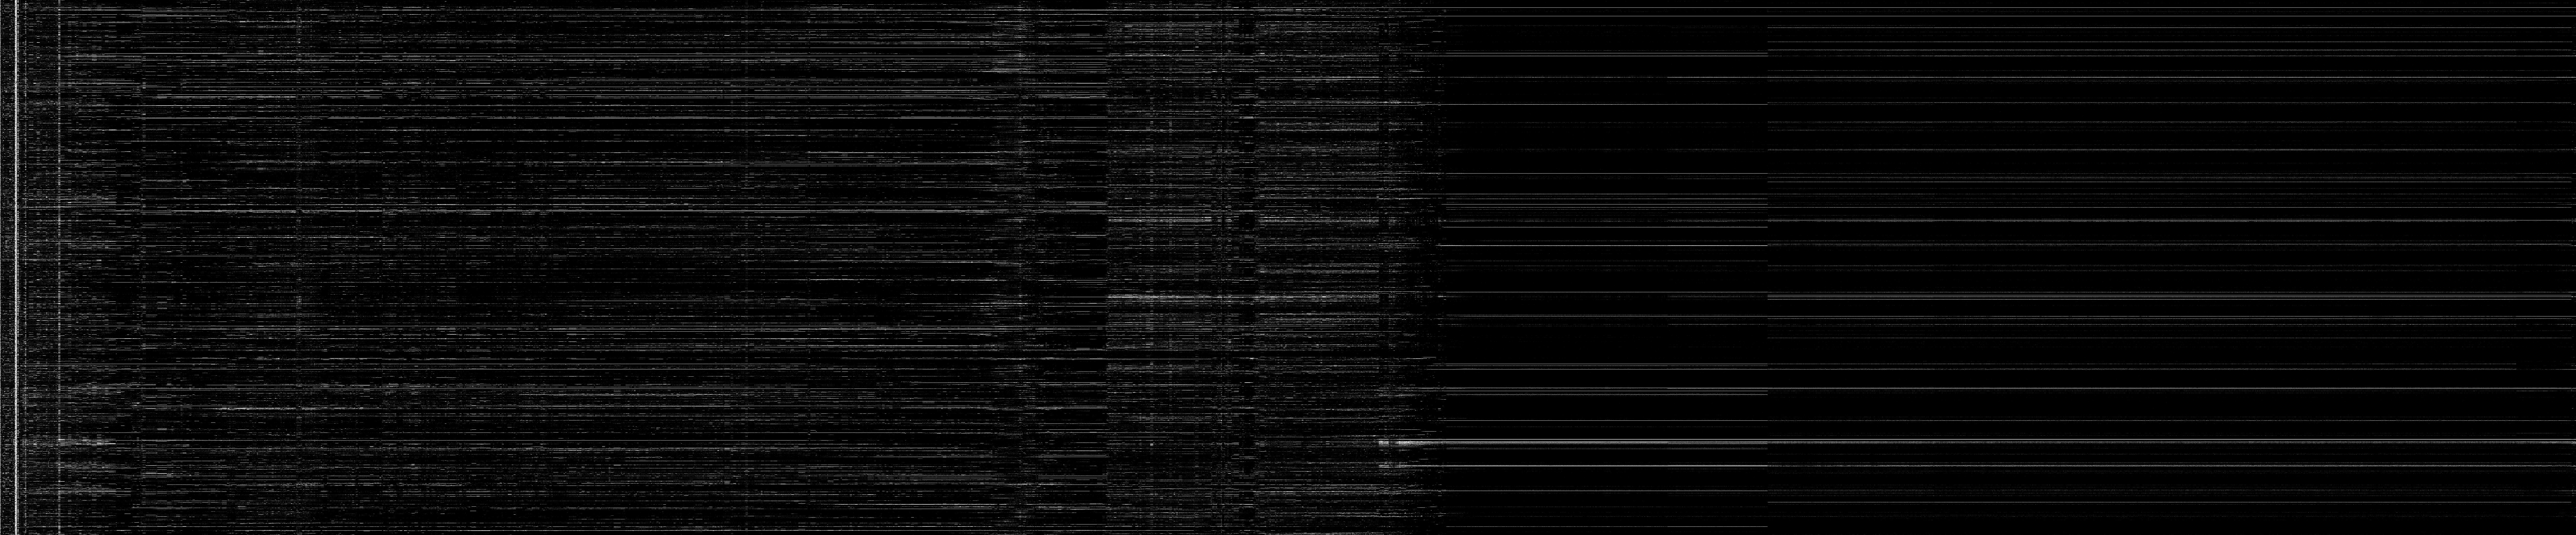 dynamics_84990_B.state.zoom